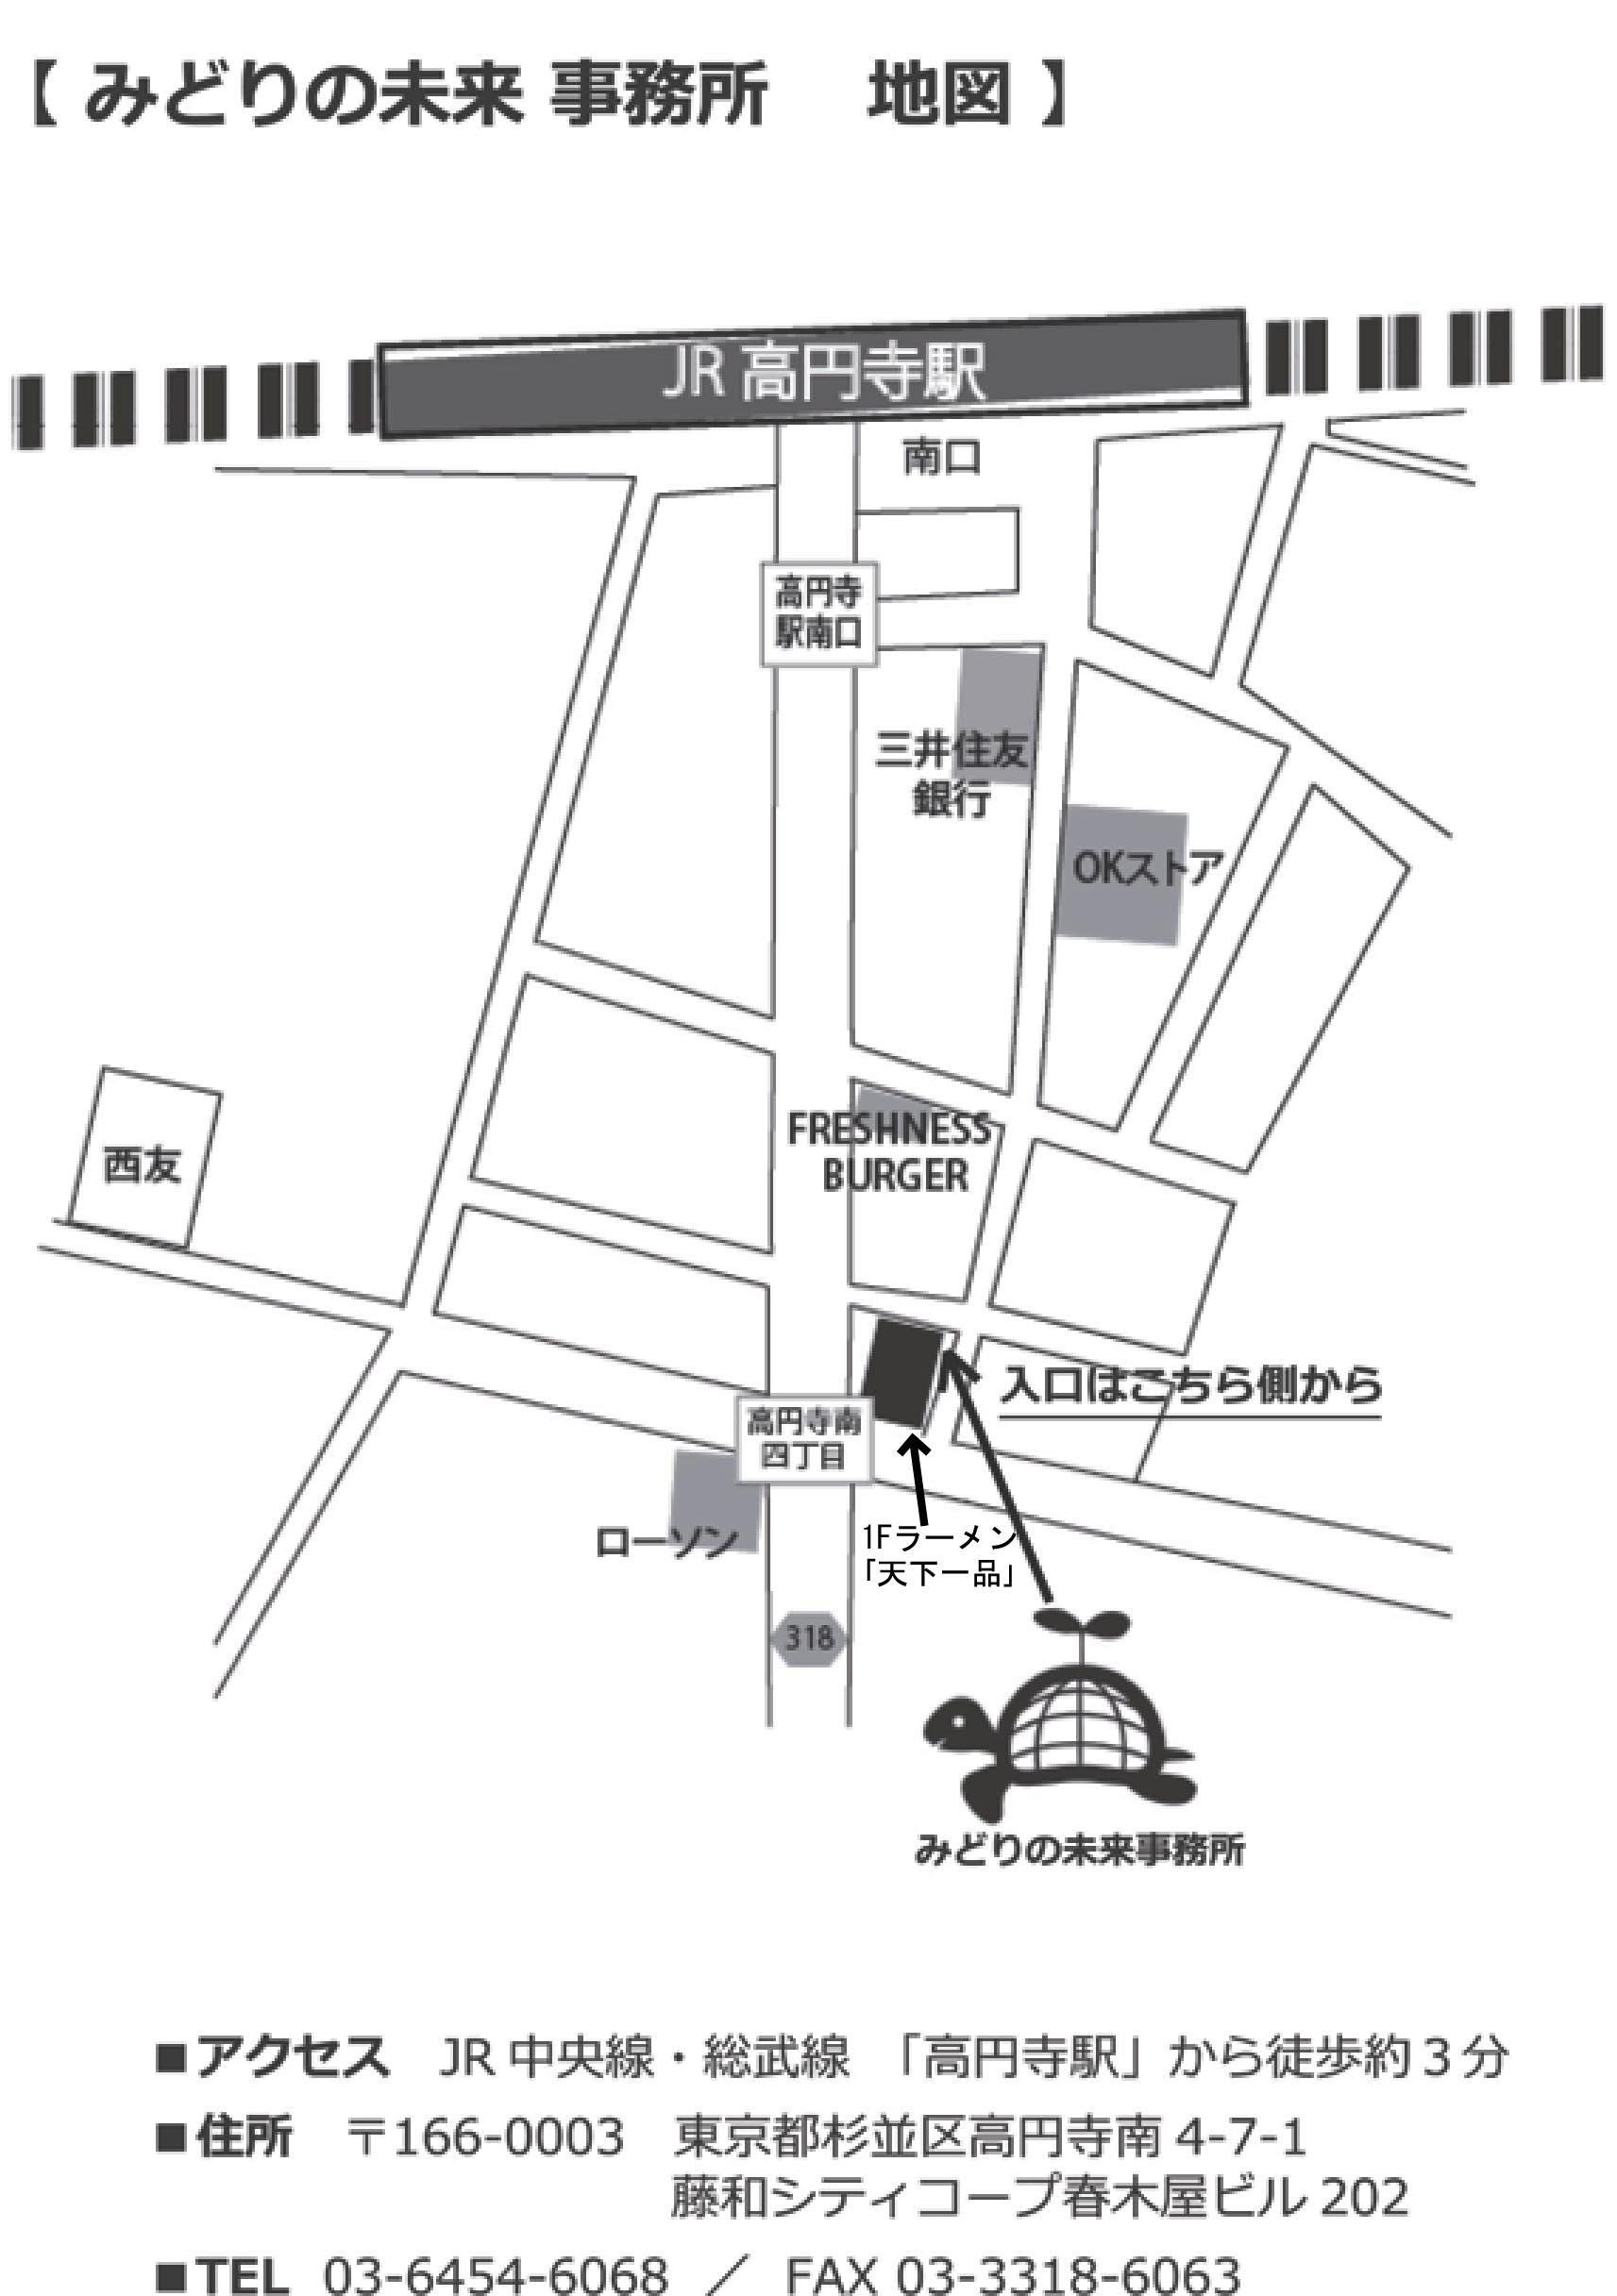 map0426.jpg